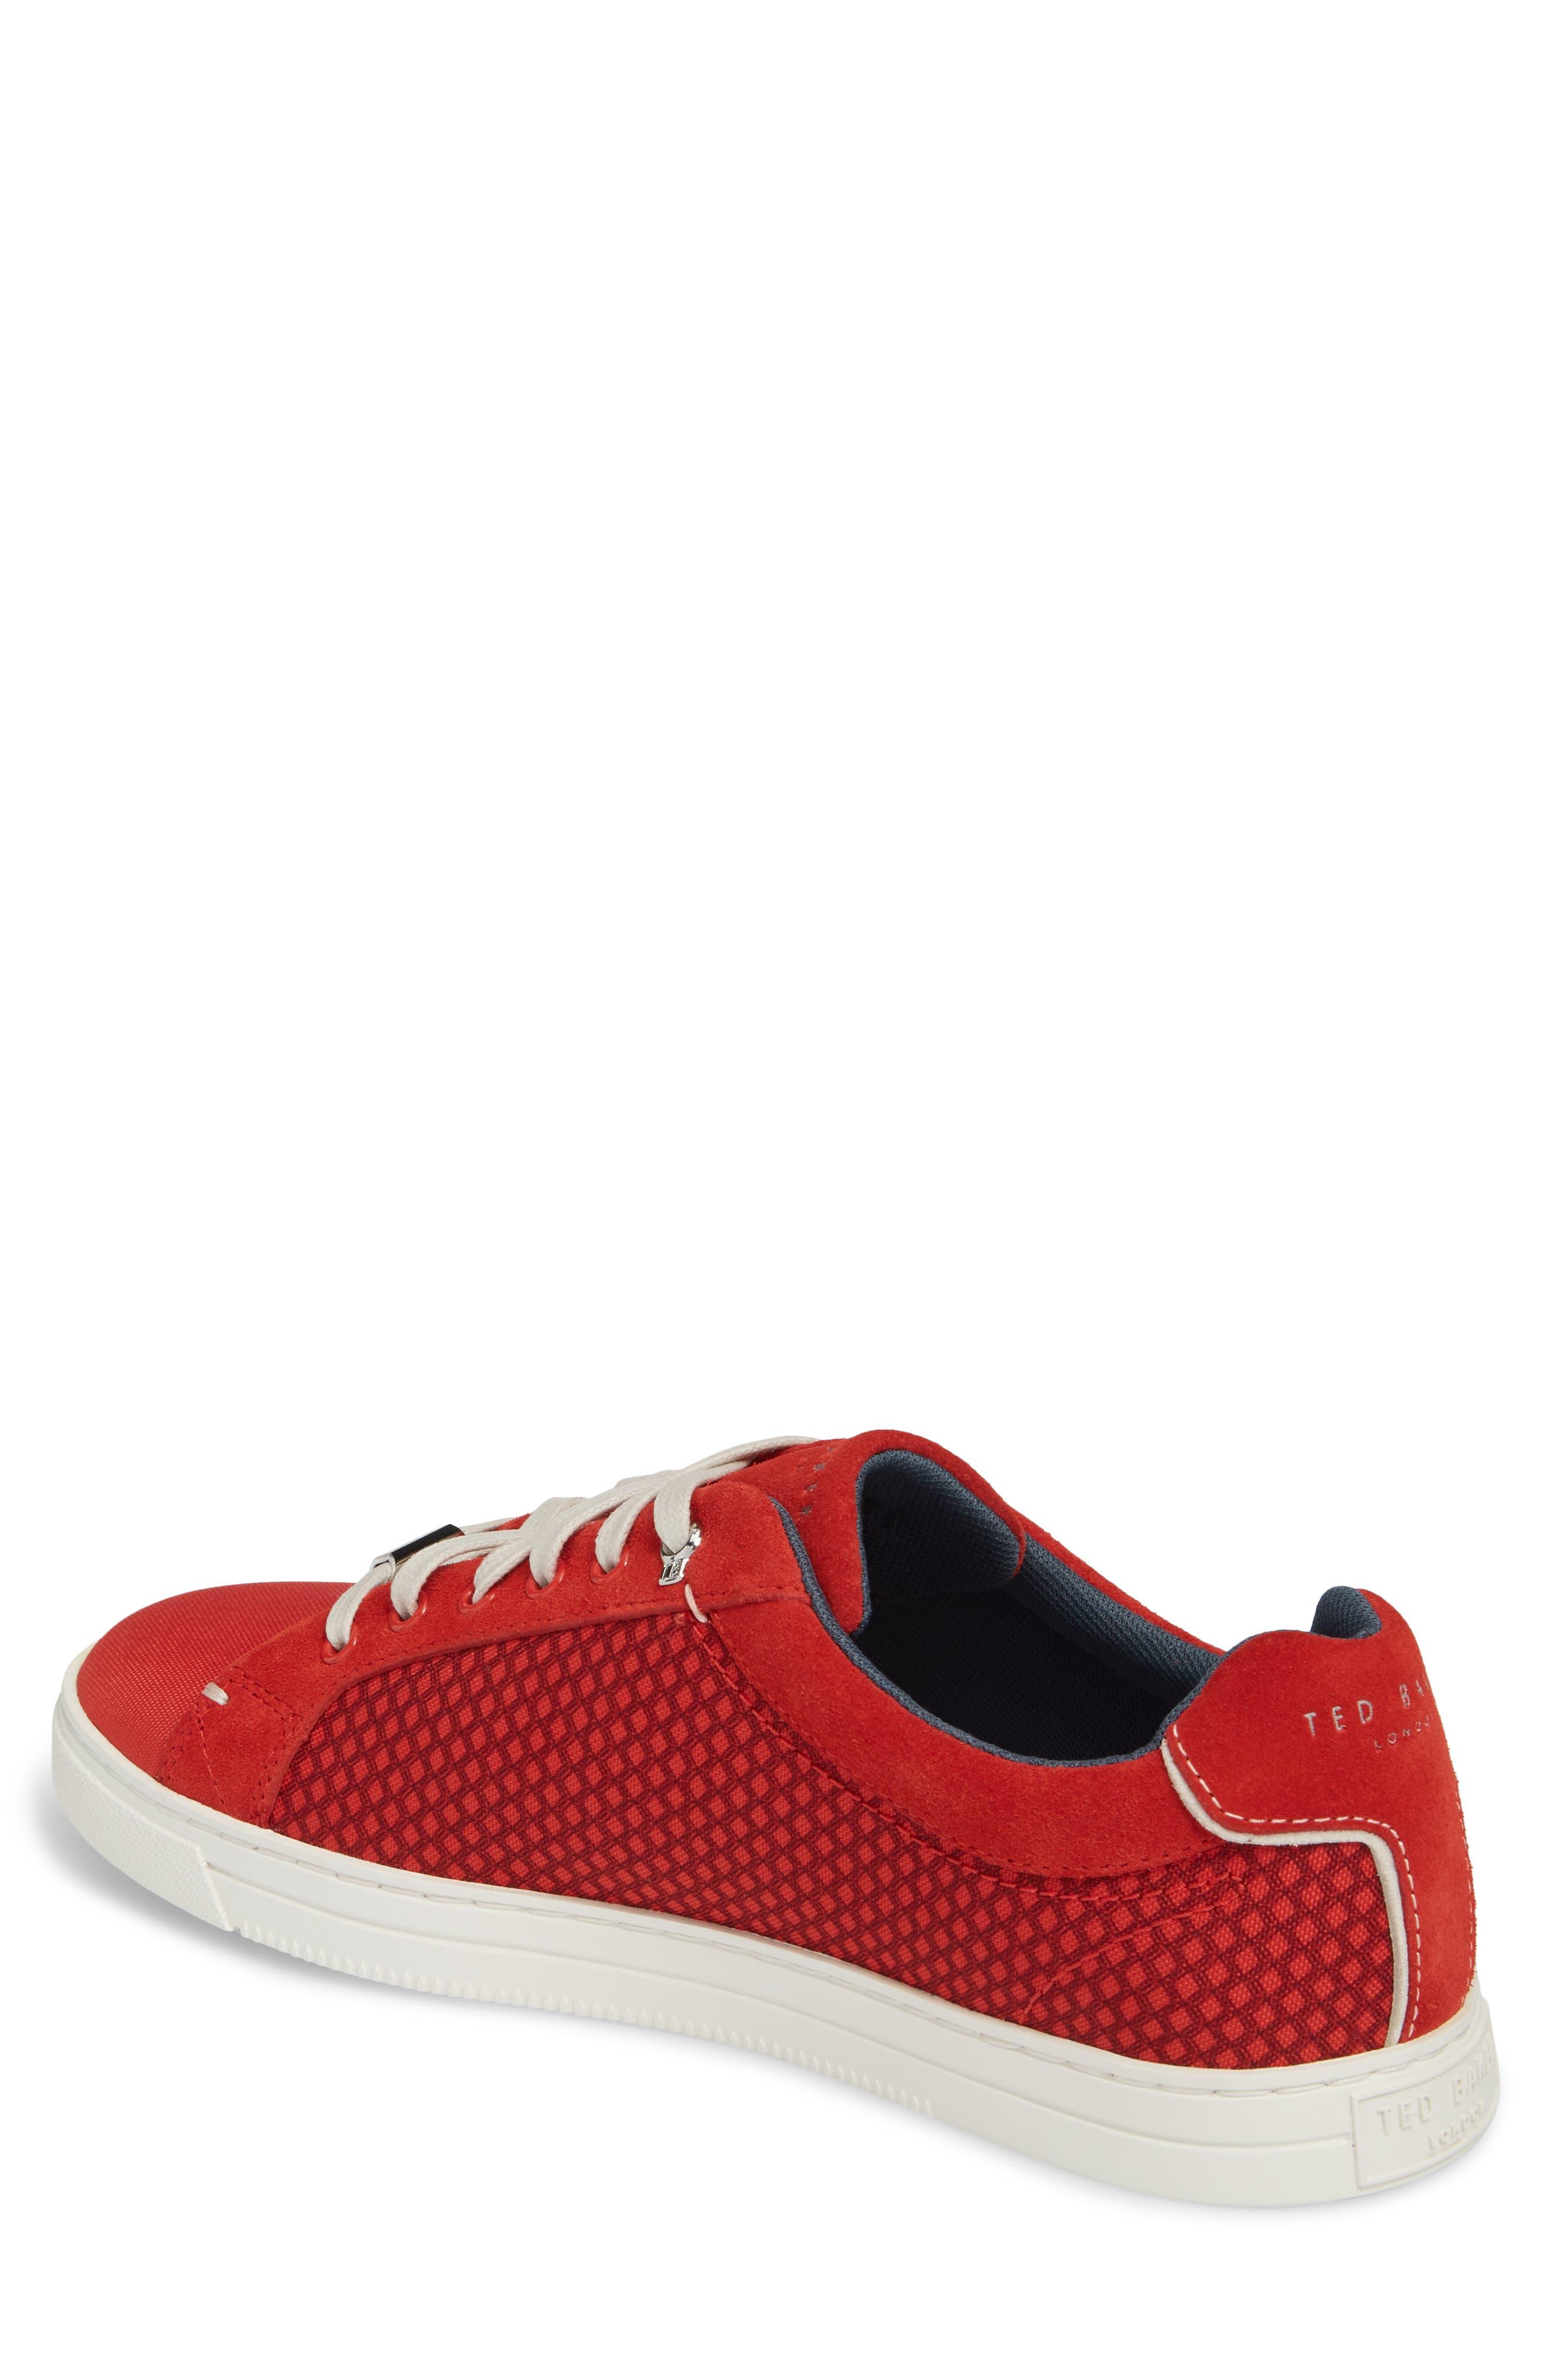 Alternate Image 2  - Ted Baker London Sarpio Sneaker (Men)